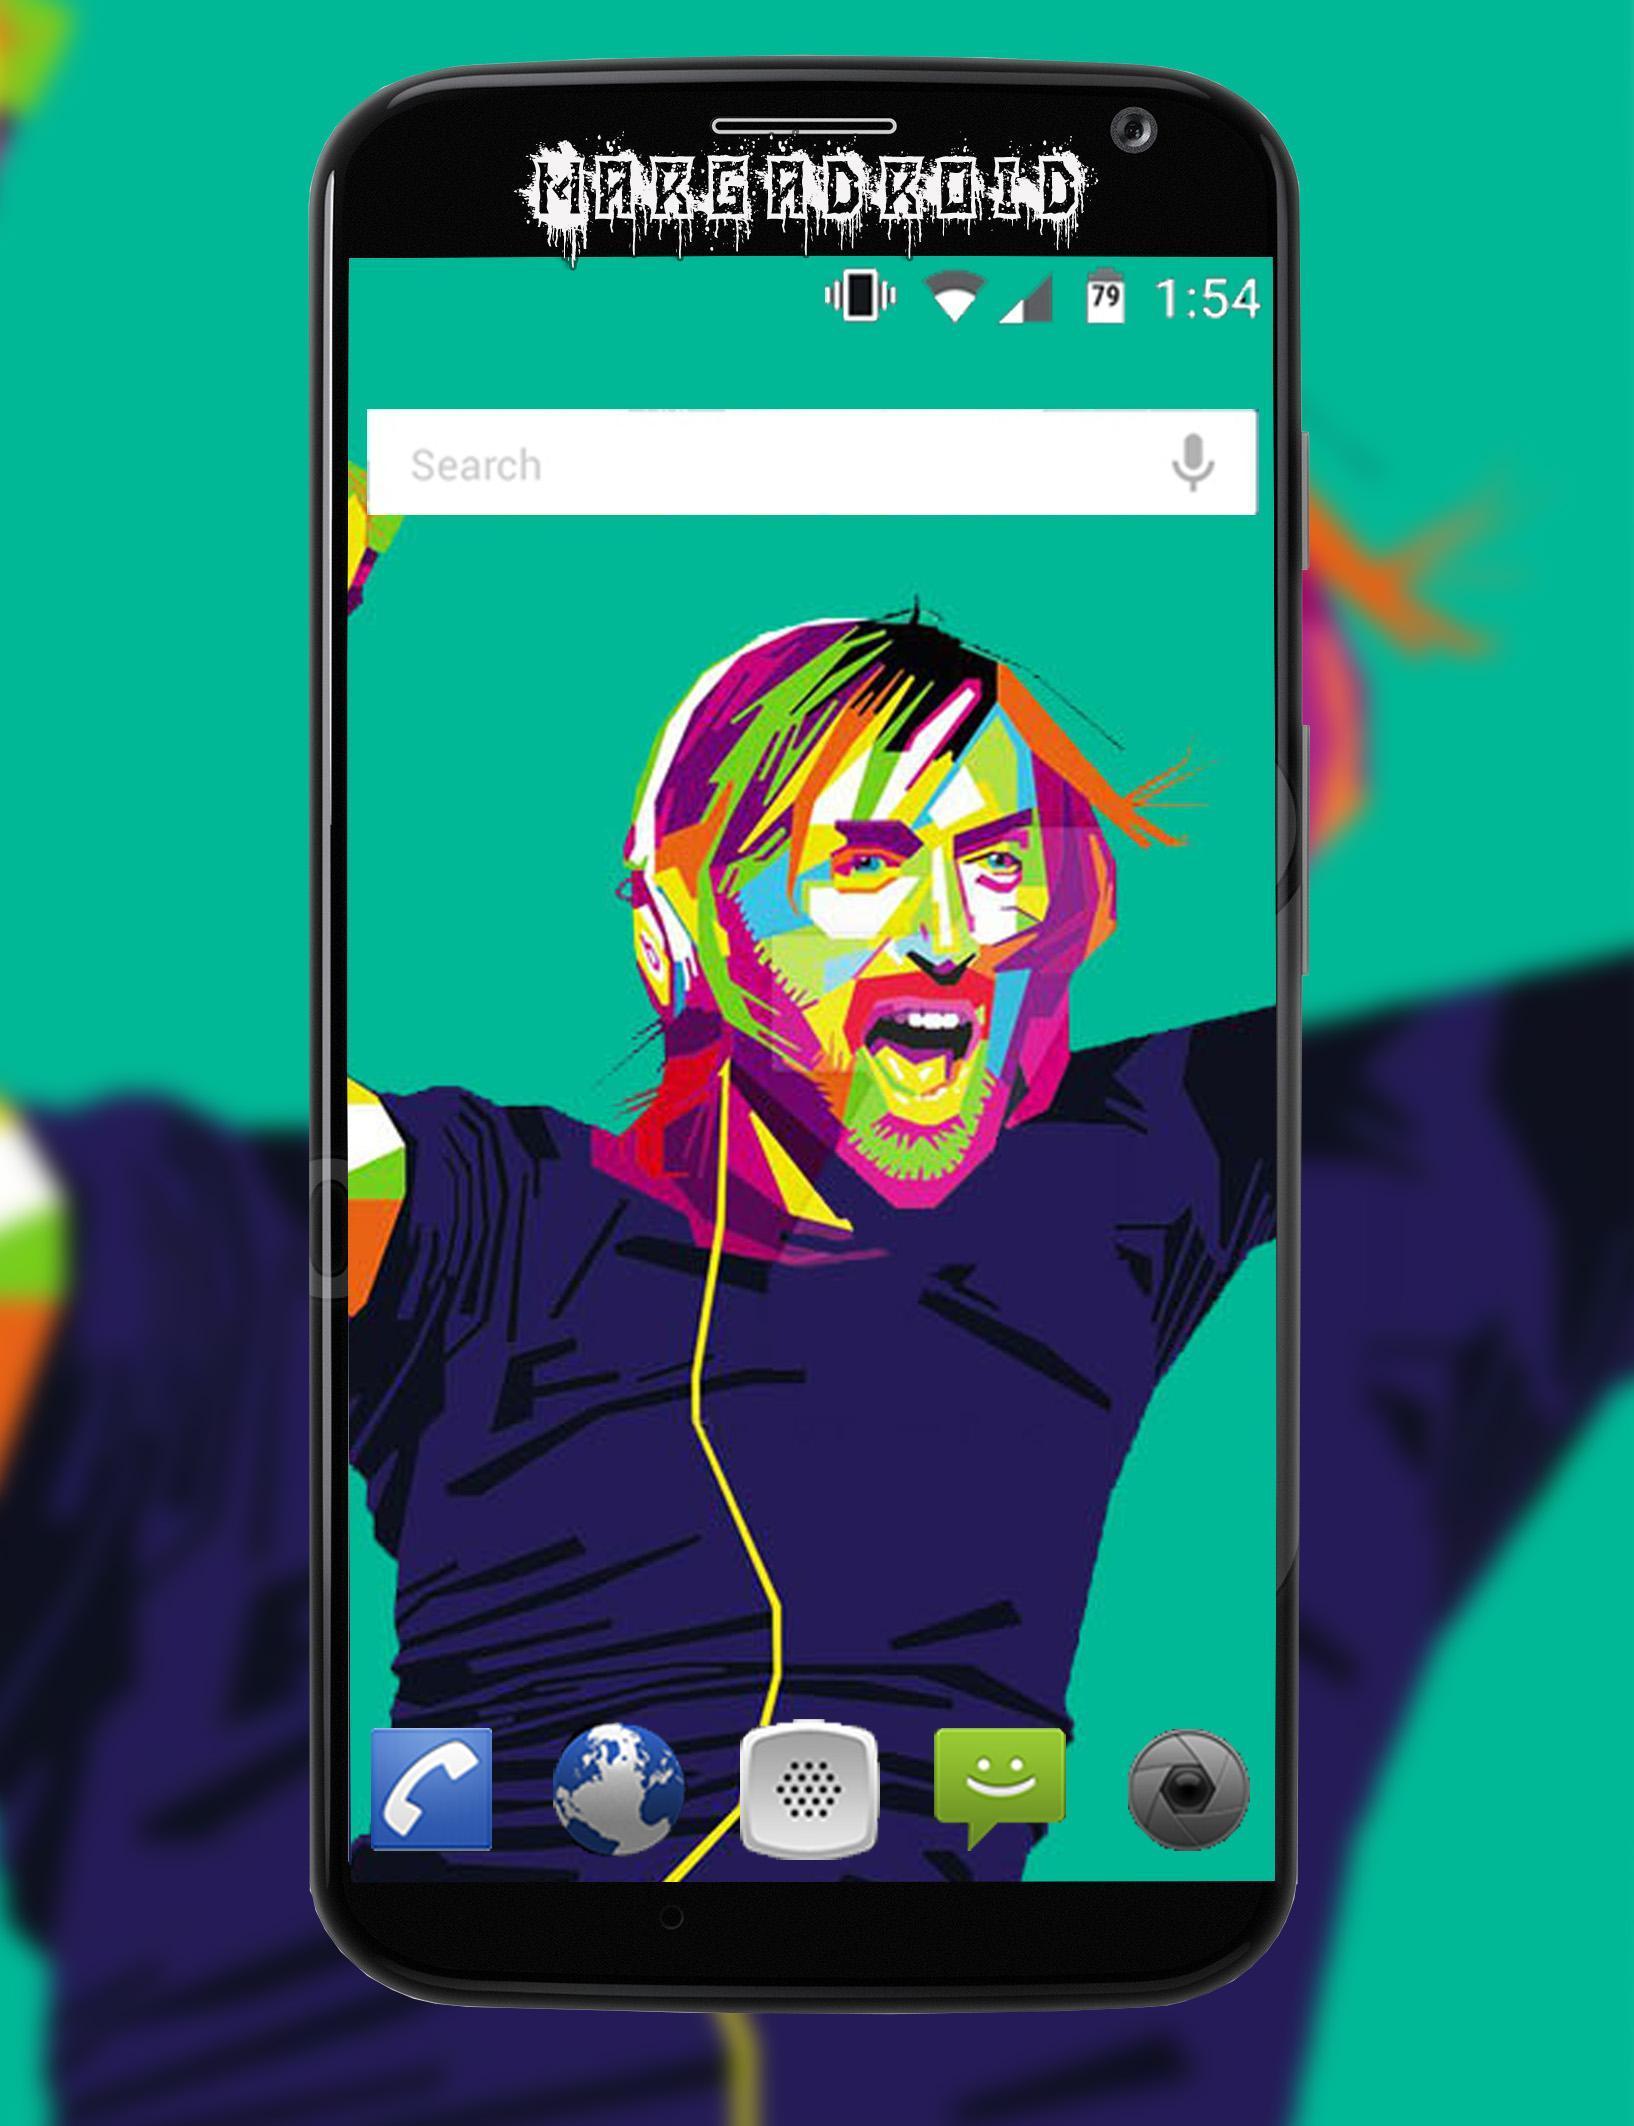 Dj David Guetta Wallpaper For Android Apk Download